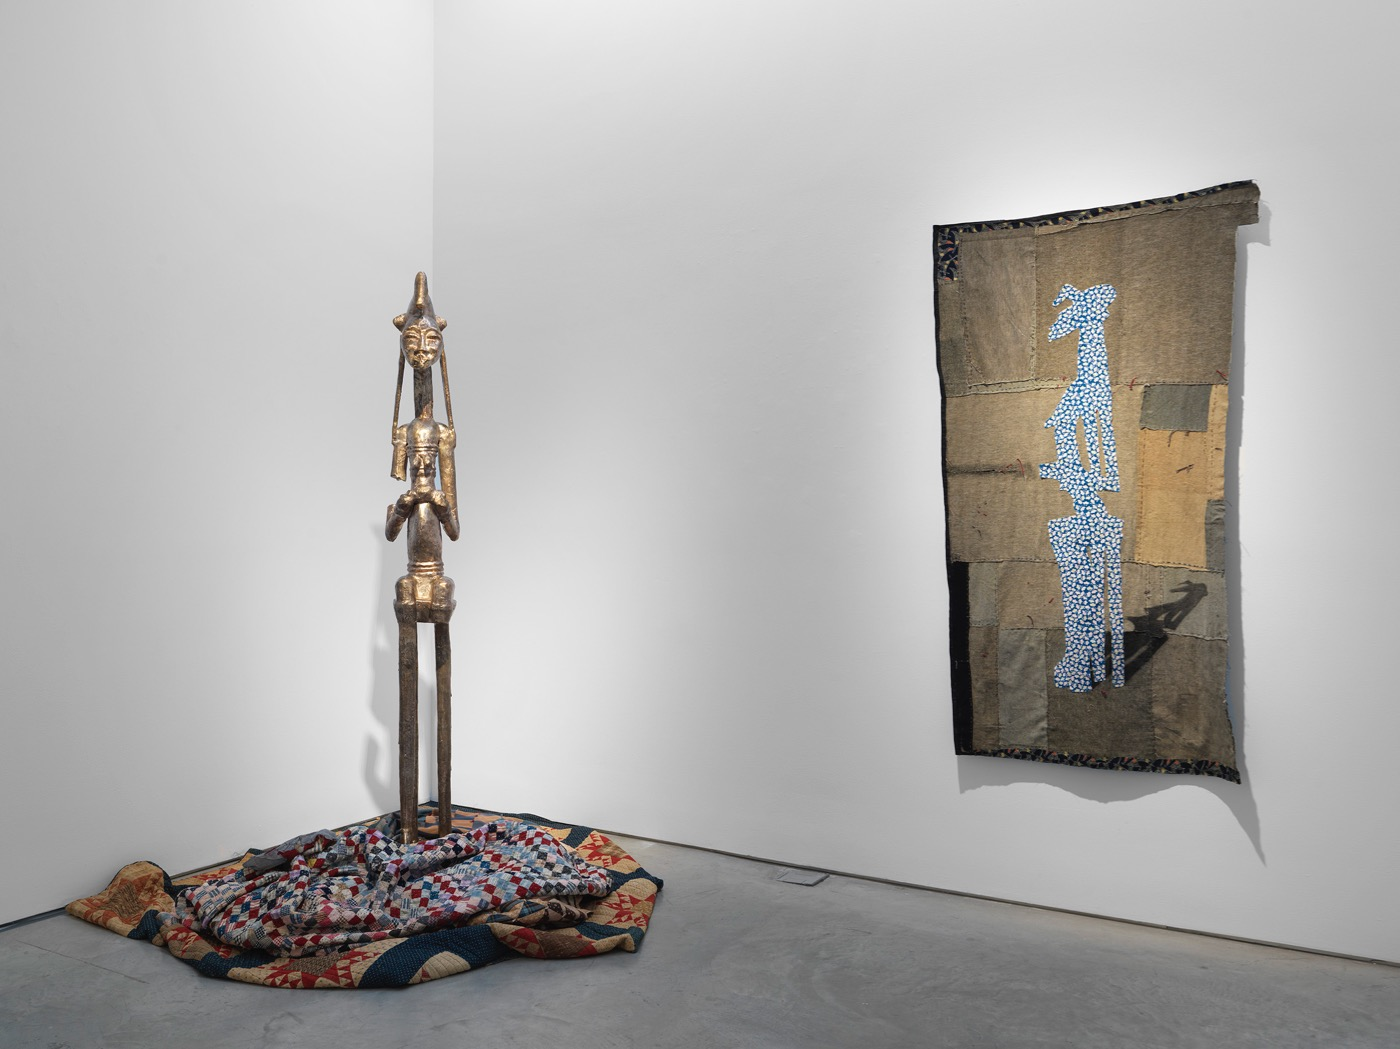 Sanford Biggers, African American Art, African American Artist, Black Art, Black Artist, KOLUMN Magazine, KOLUMN